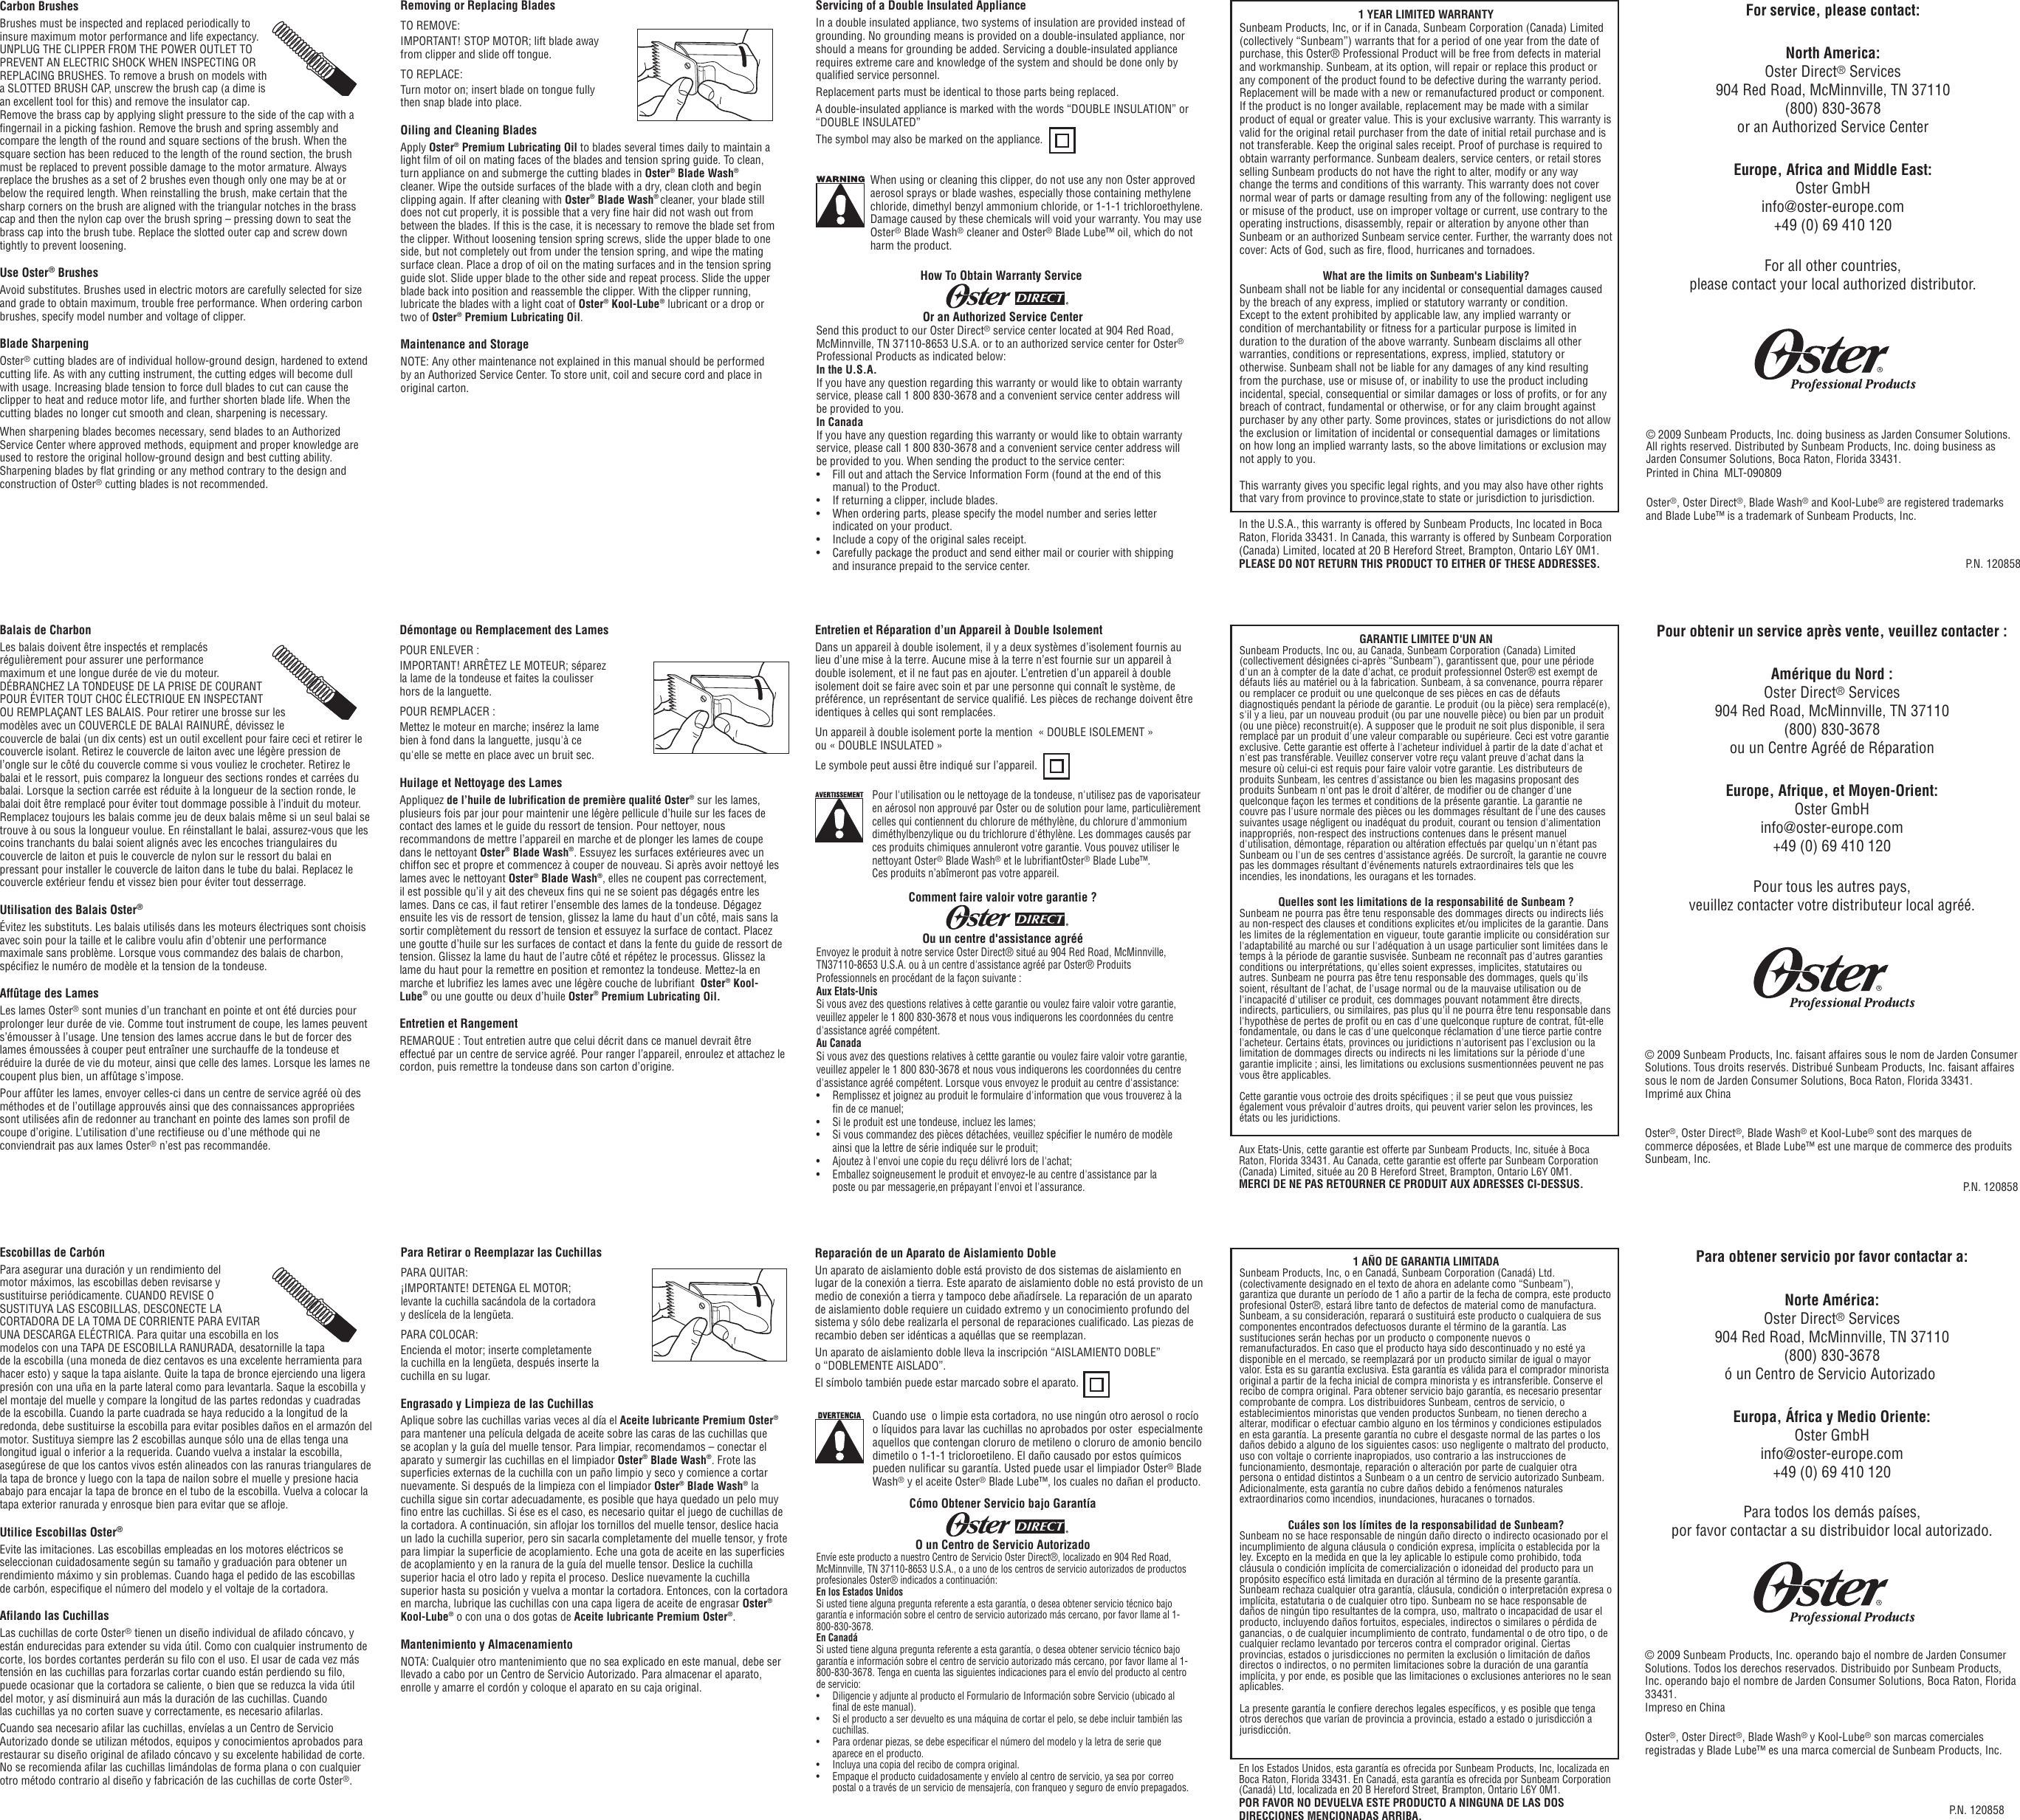 Oster 76077 Users Manual Sbb09030classic76ib52512back